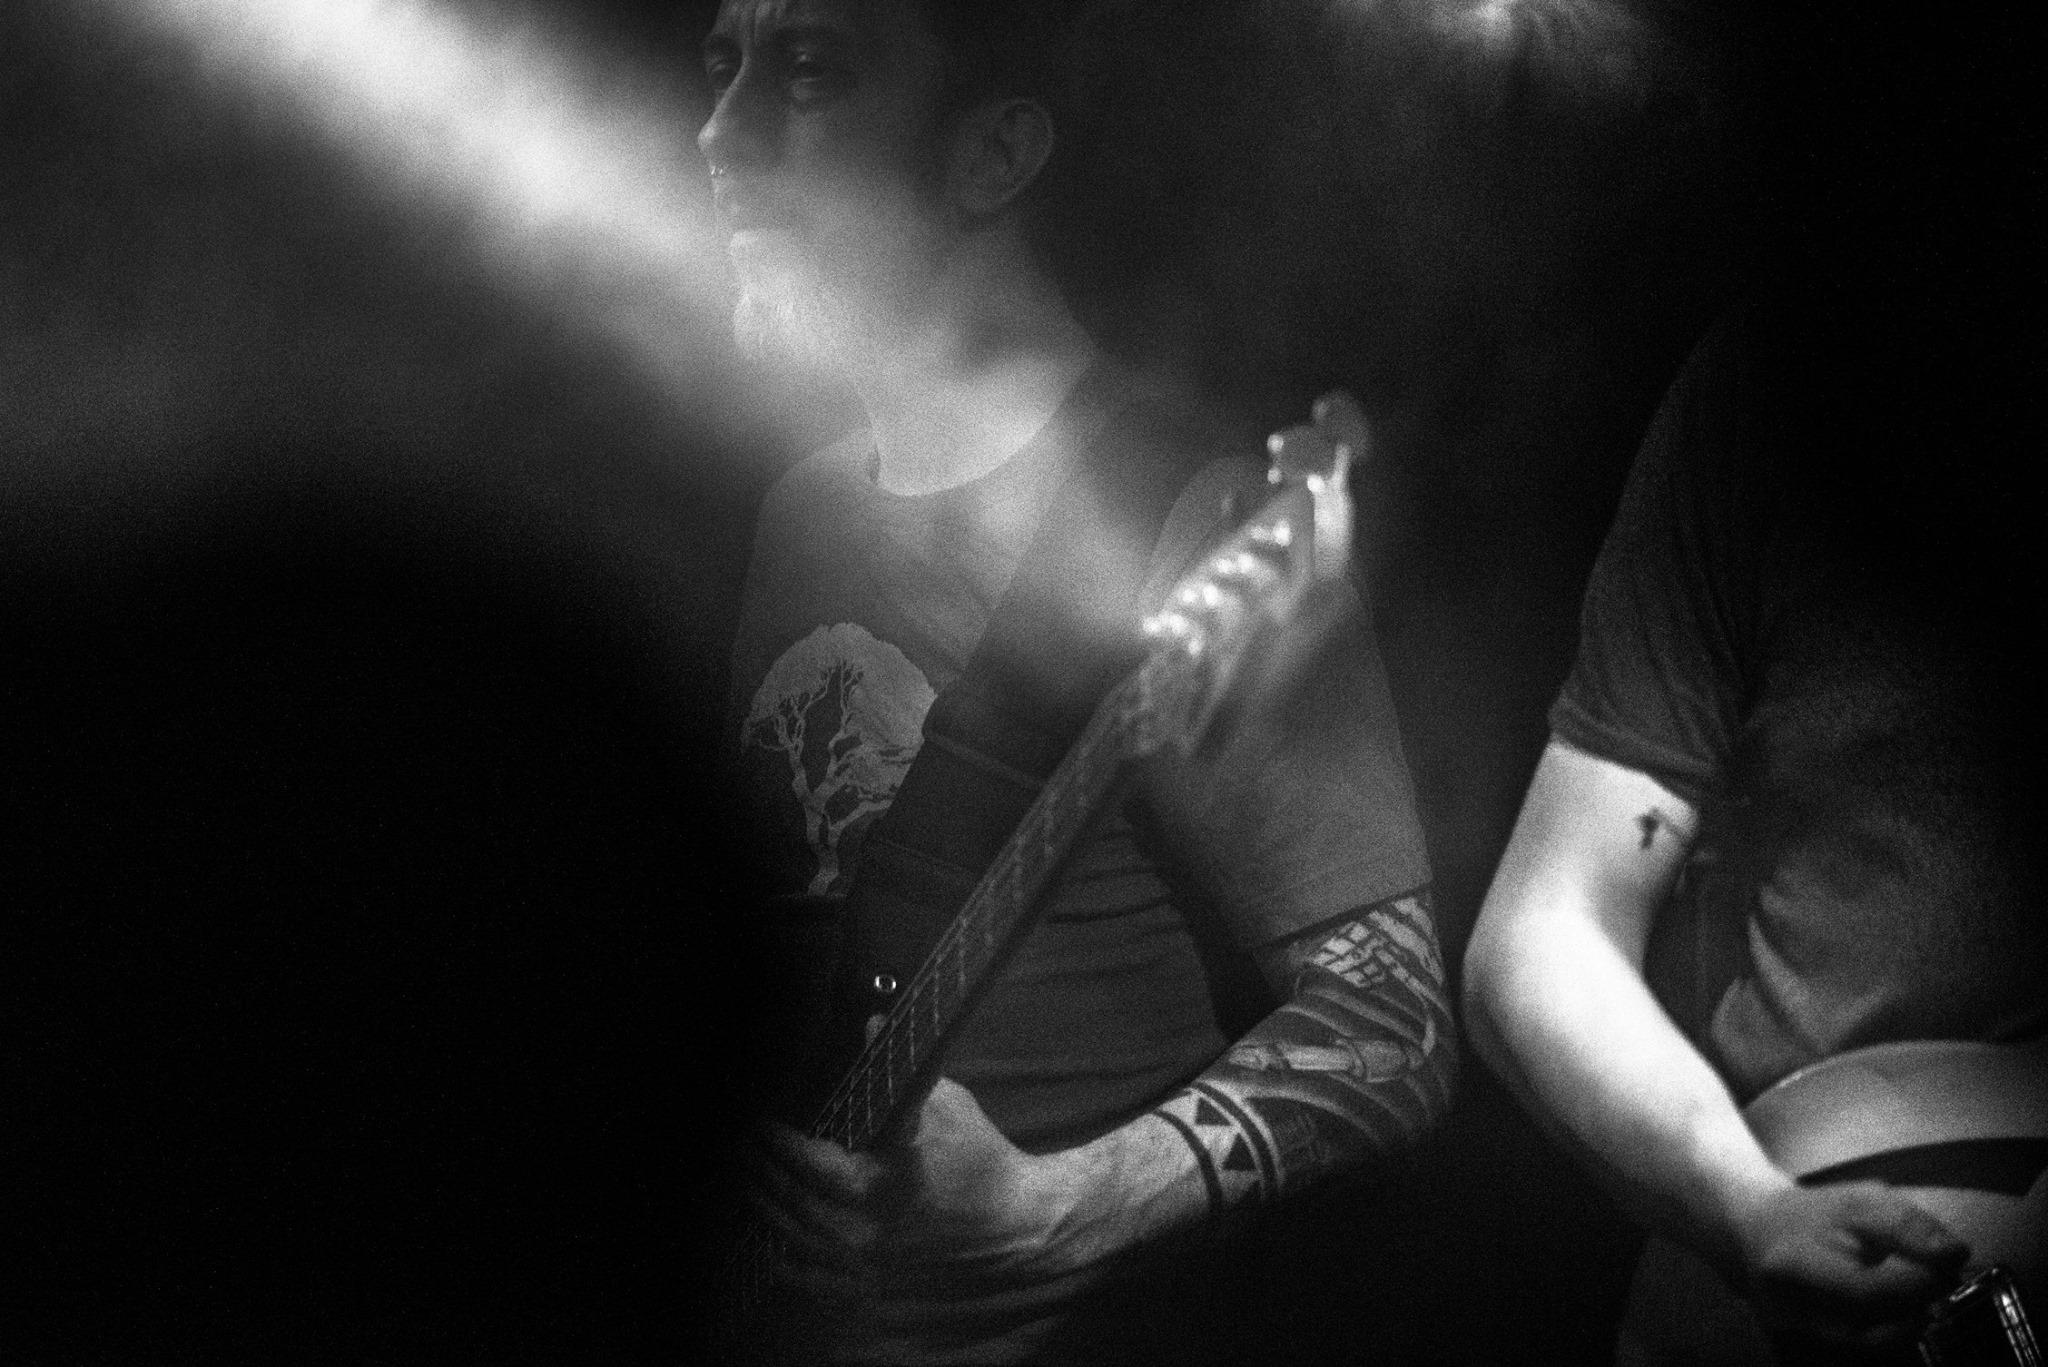 Suralin Live, Band Chemnitz, D